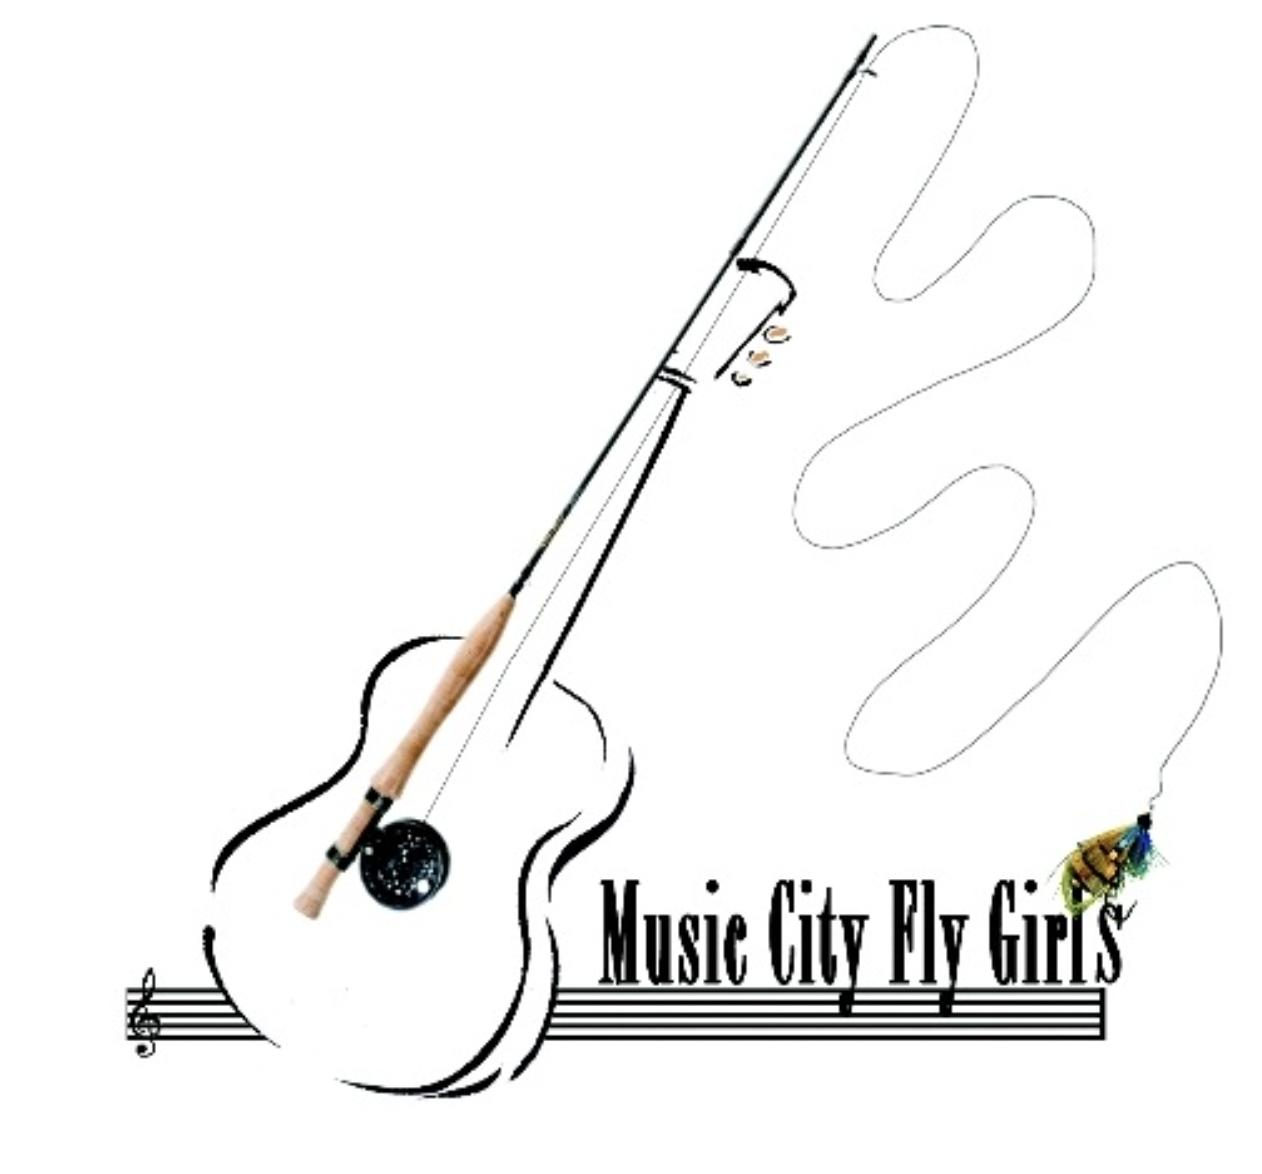 music city fly girls